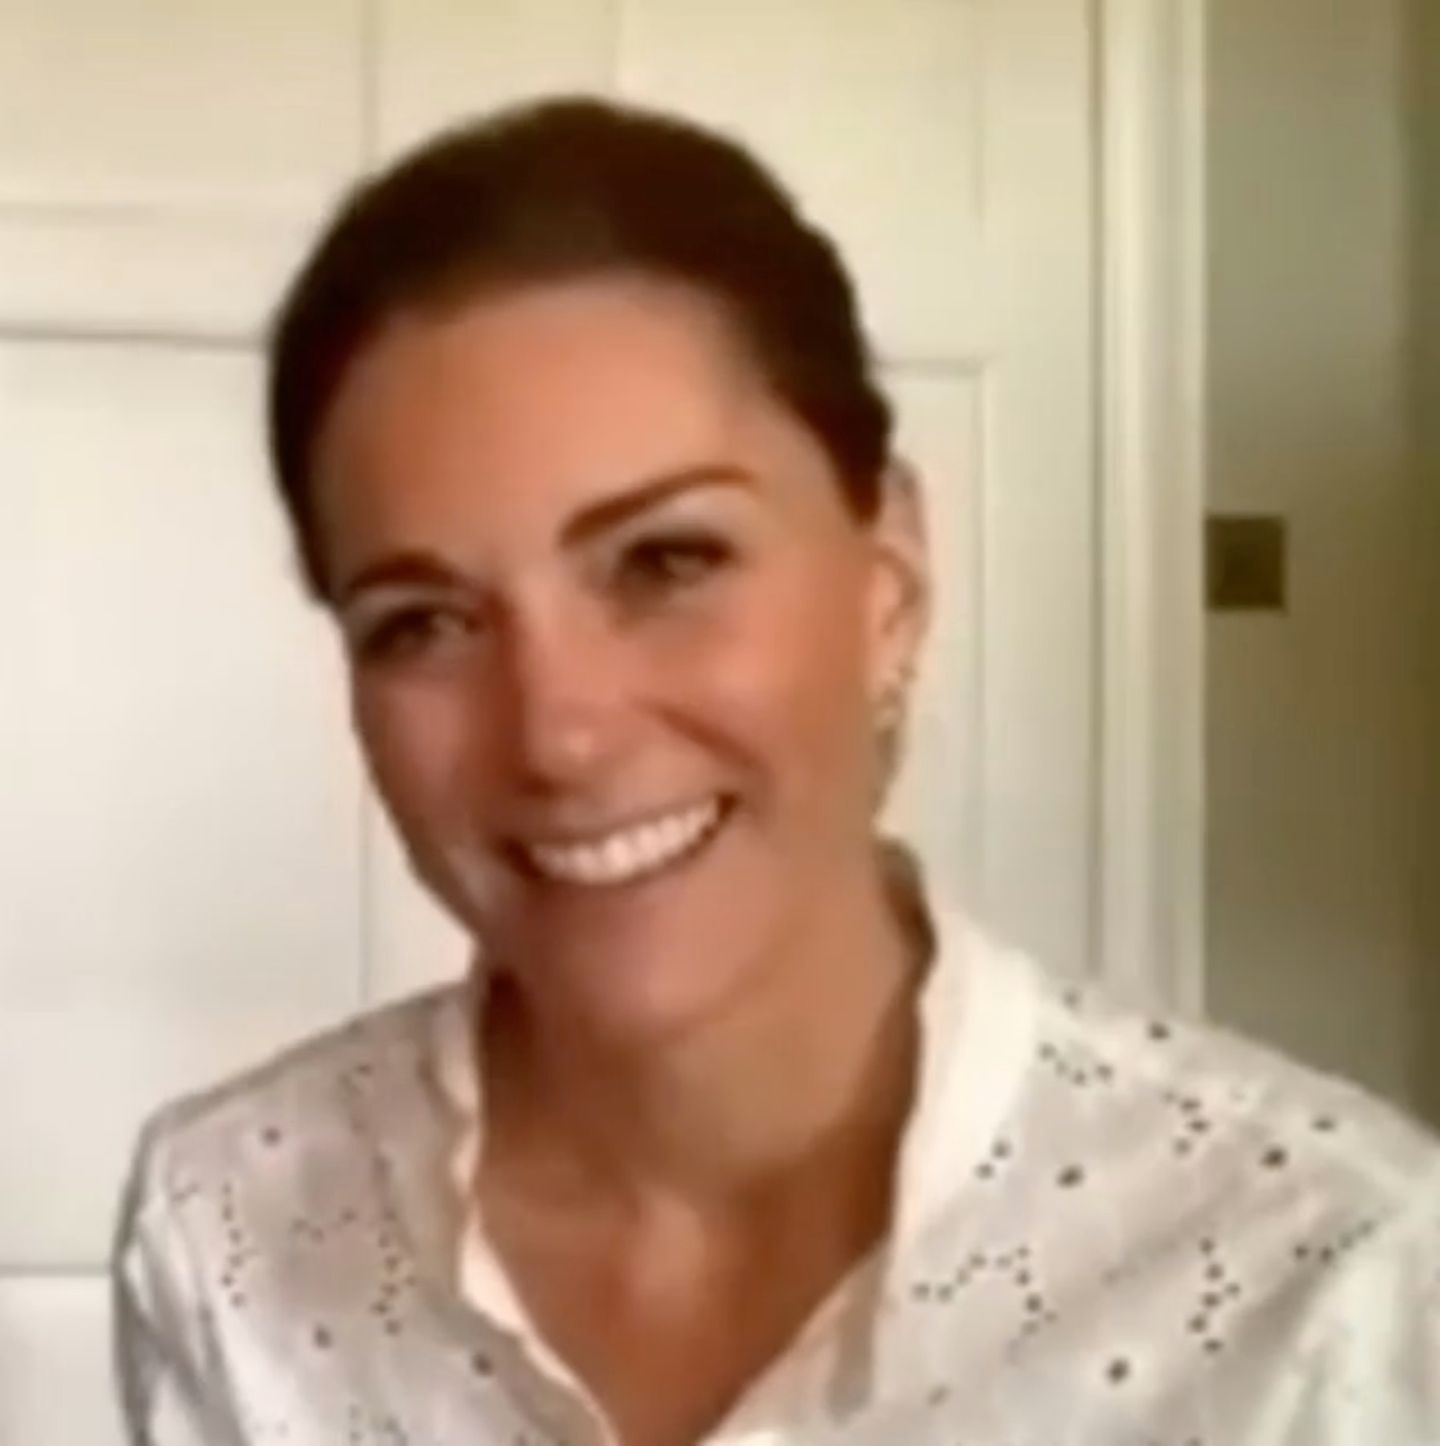 Herzogin Kate recycelt weiße Bluse